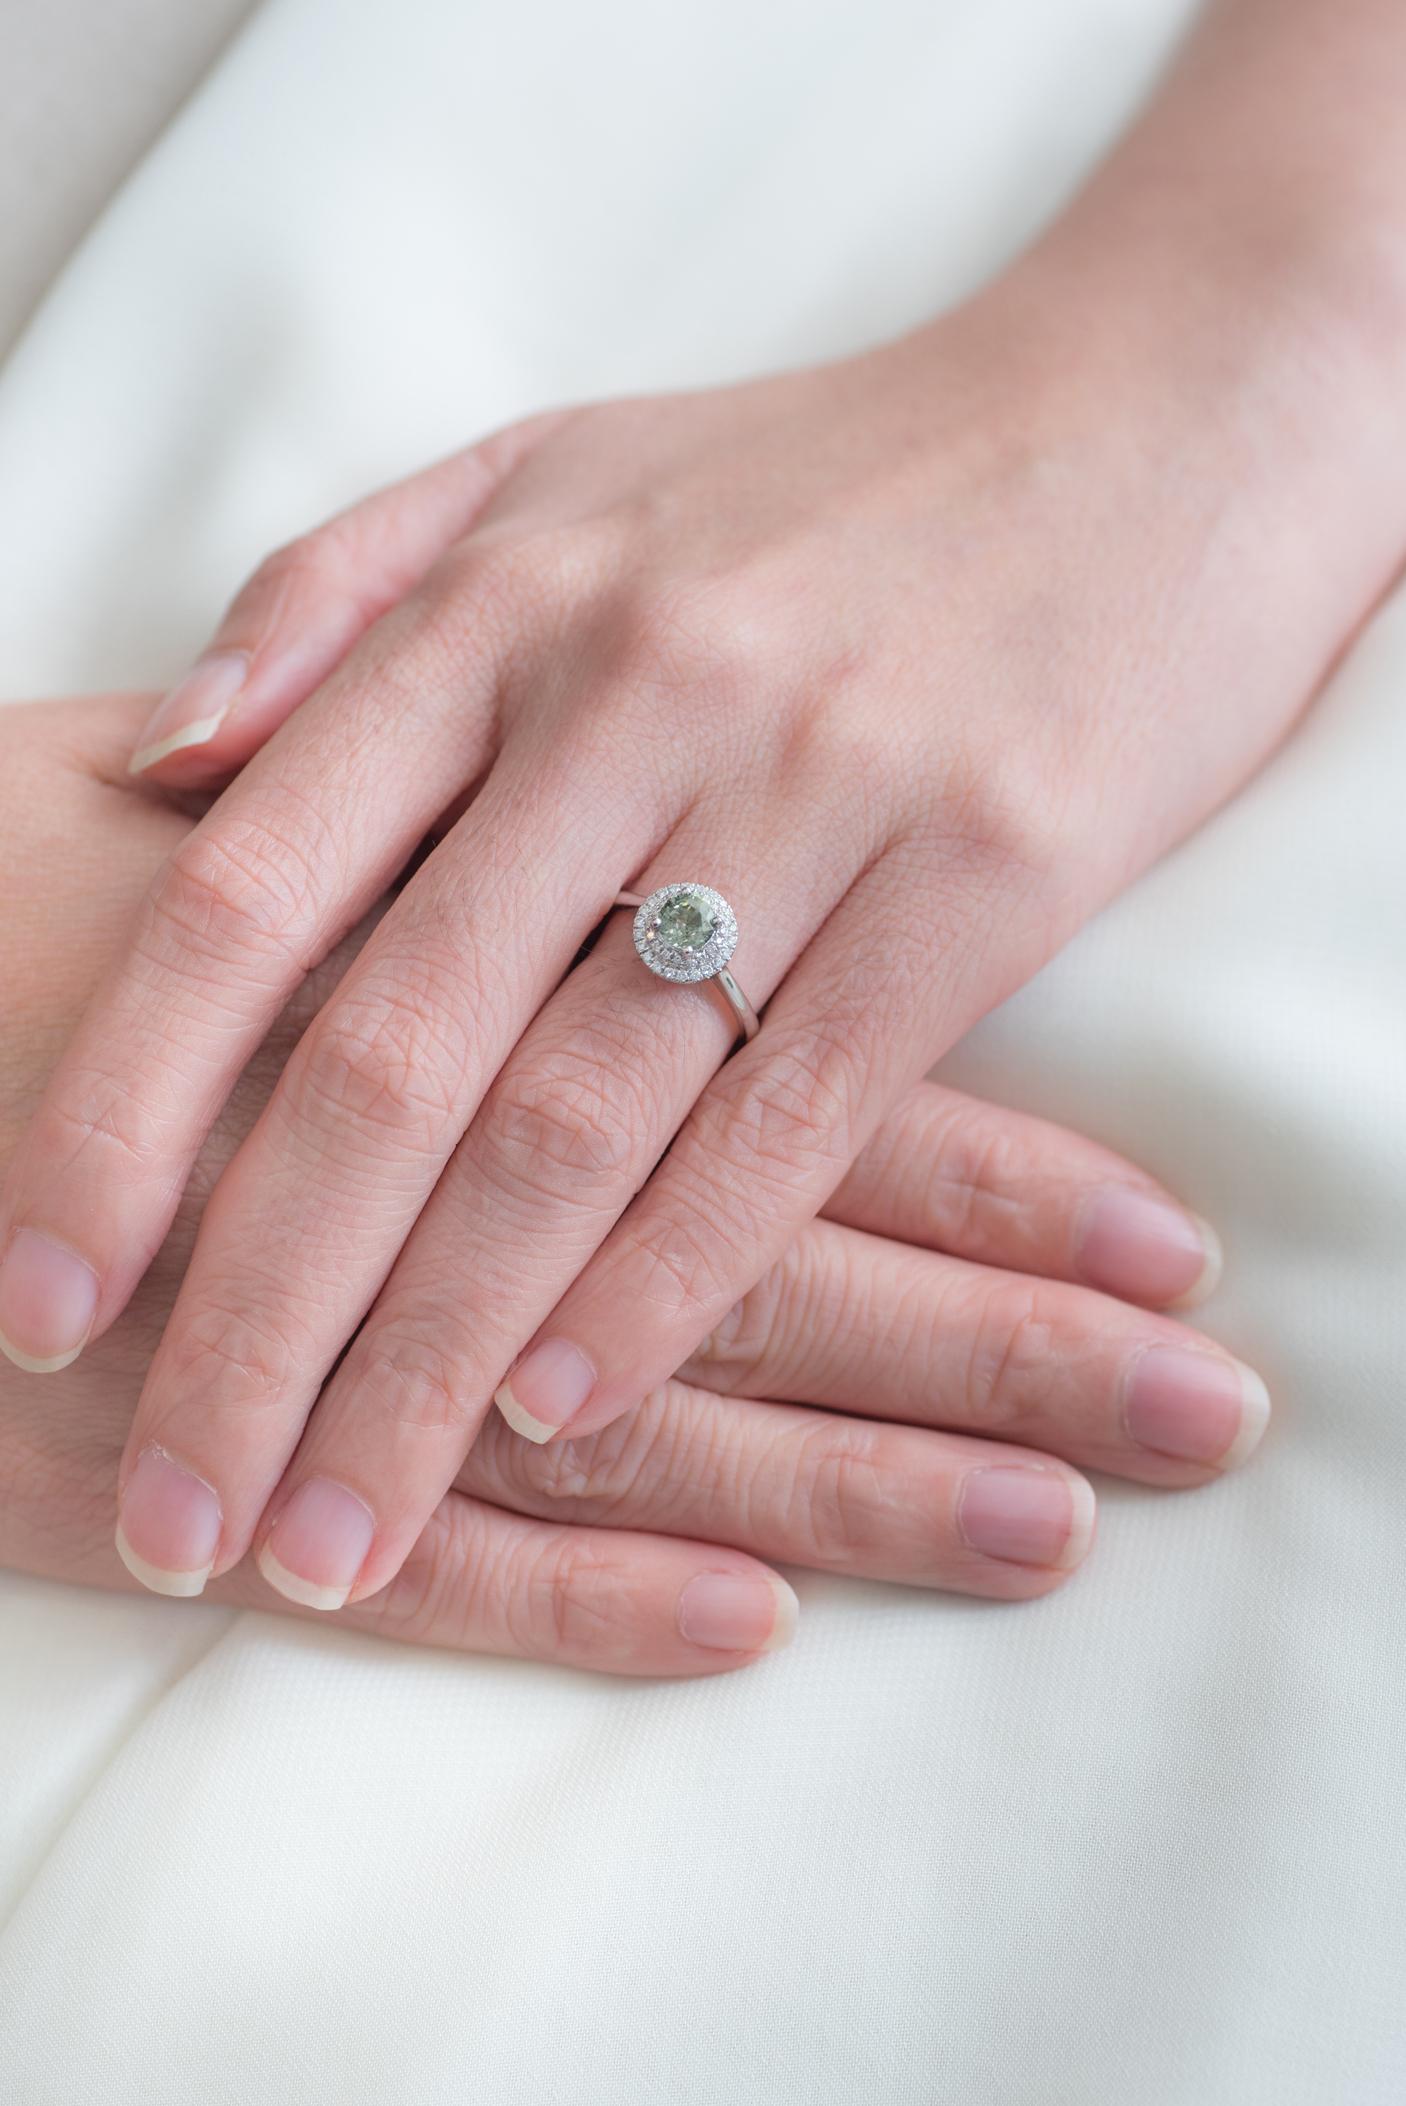 180919_Engagement-Ring_Sapphire_Lifestyle-1174.jpg